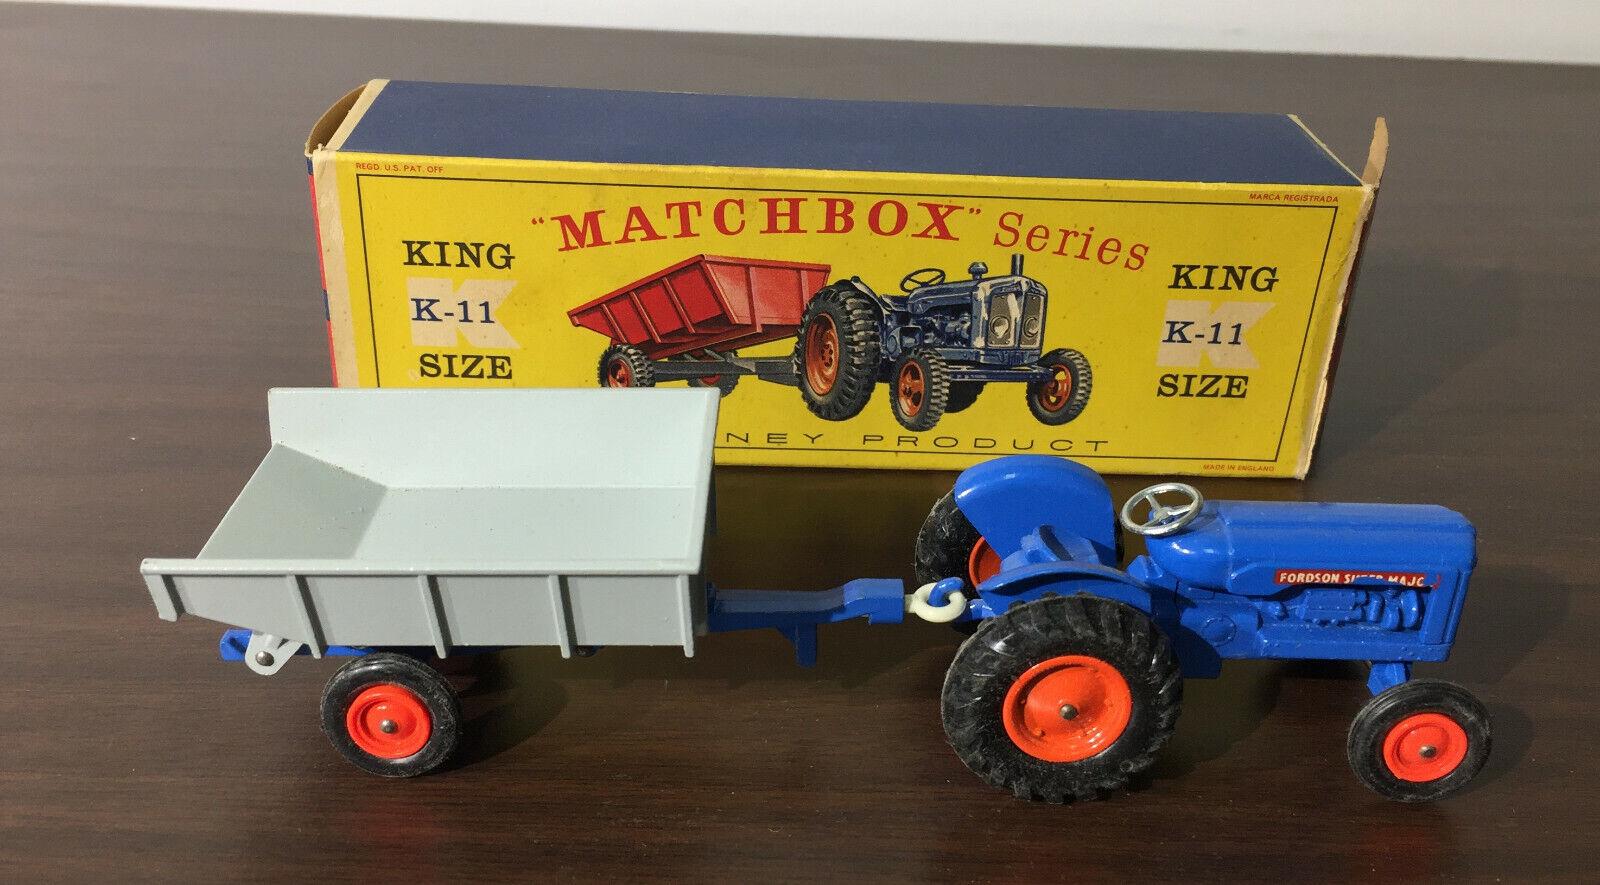 MATCHBOX KING K-11 Größe FORDSON TRACTOR AND FARM TRAILER